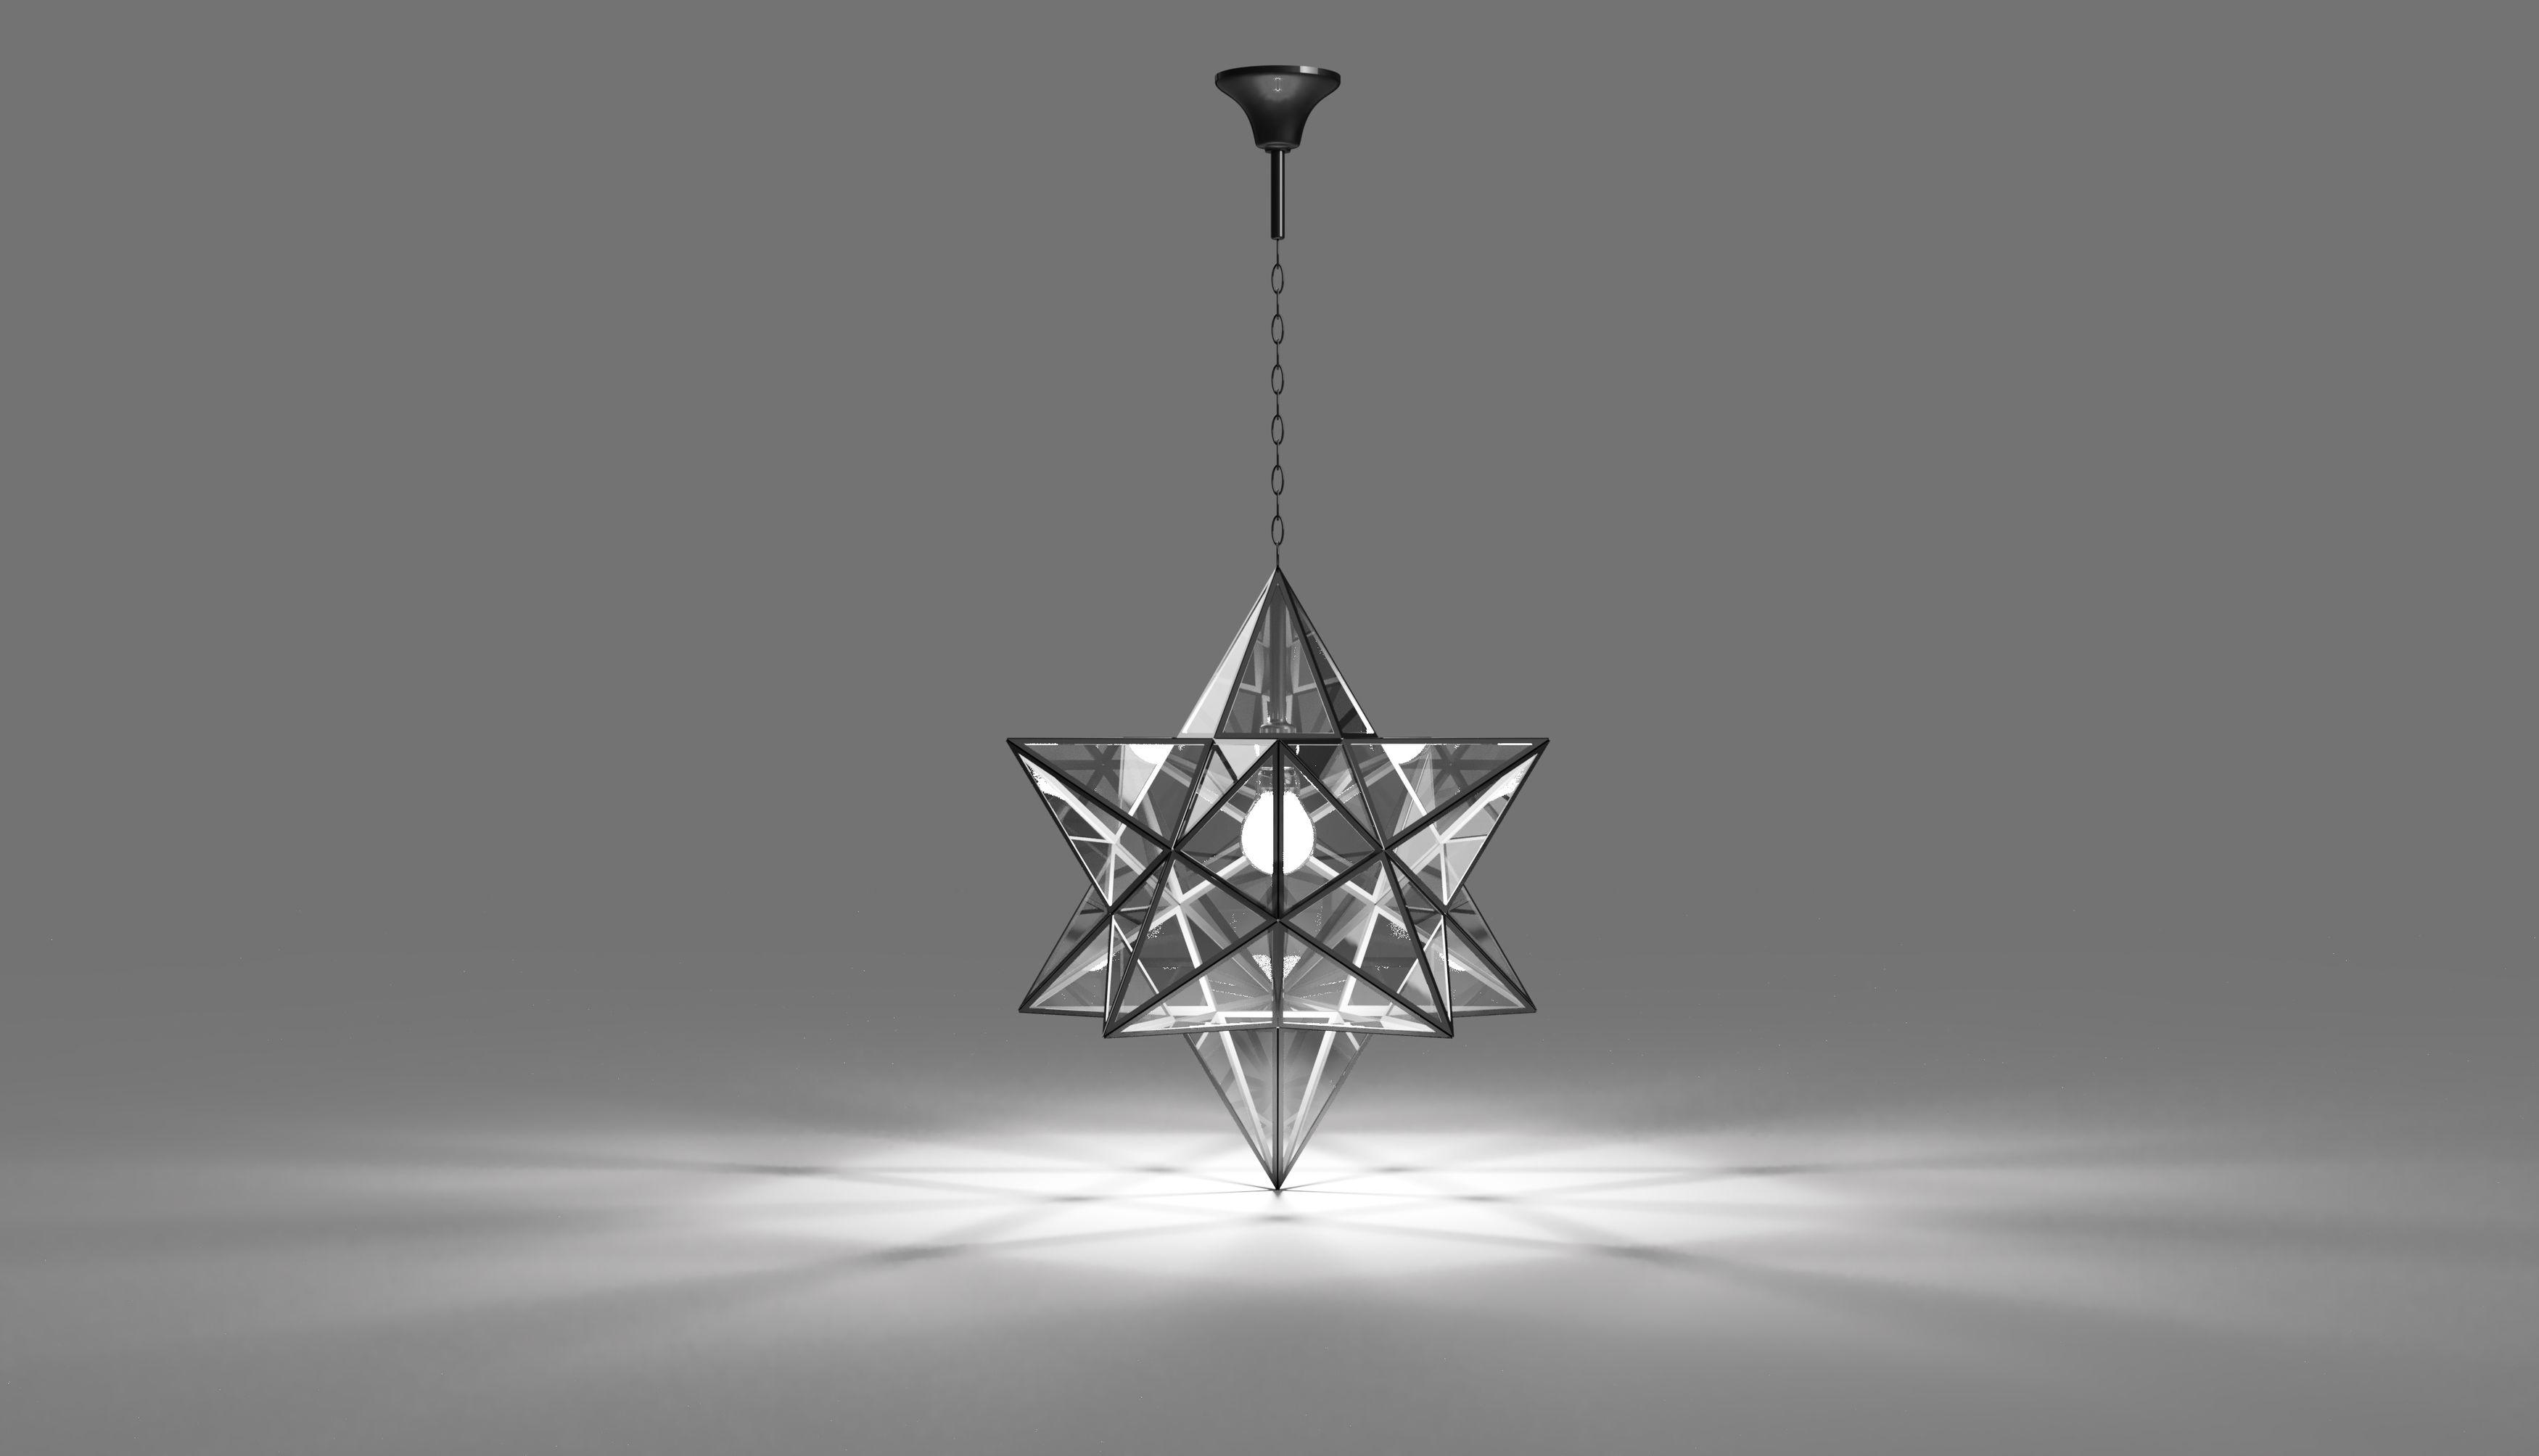 Stjarna-mindre-2019-apr-13-12-14-55am-000-customizedview34439915029-jpg-3500-3500